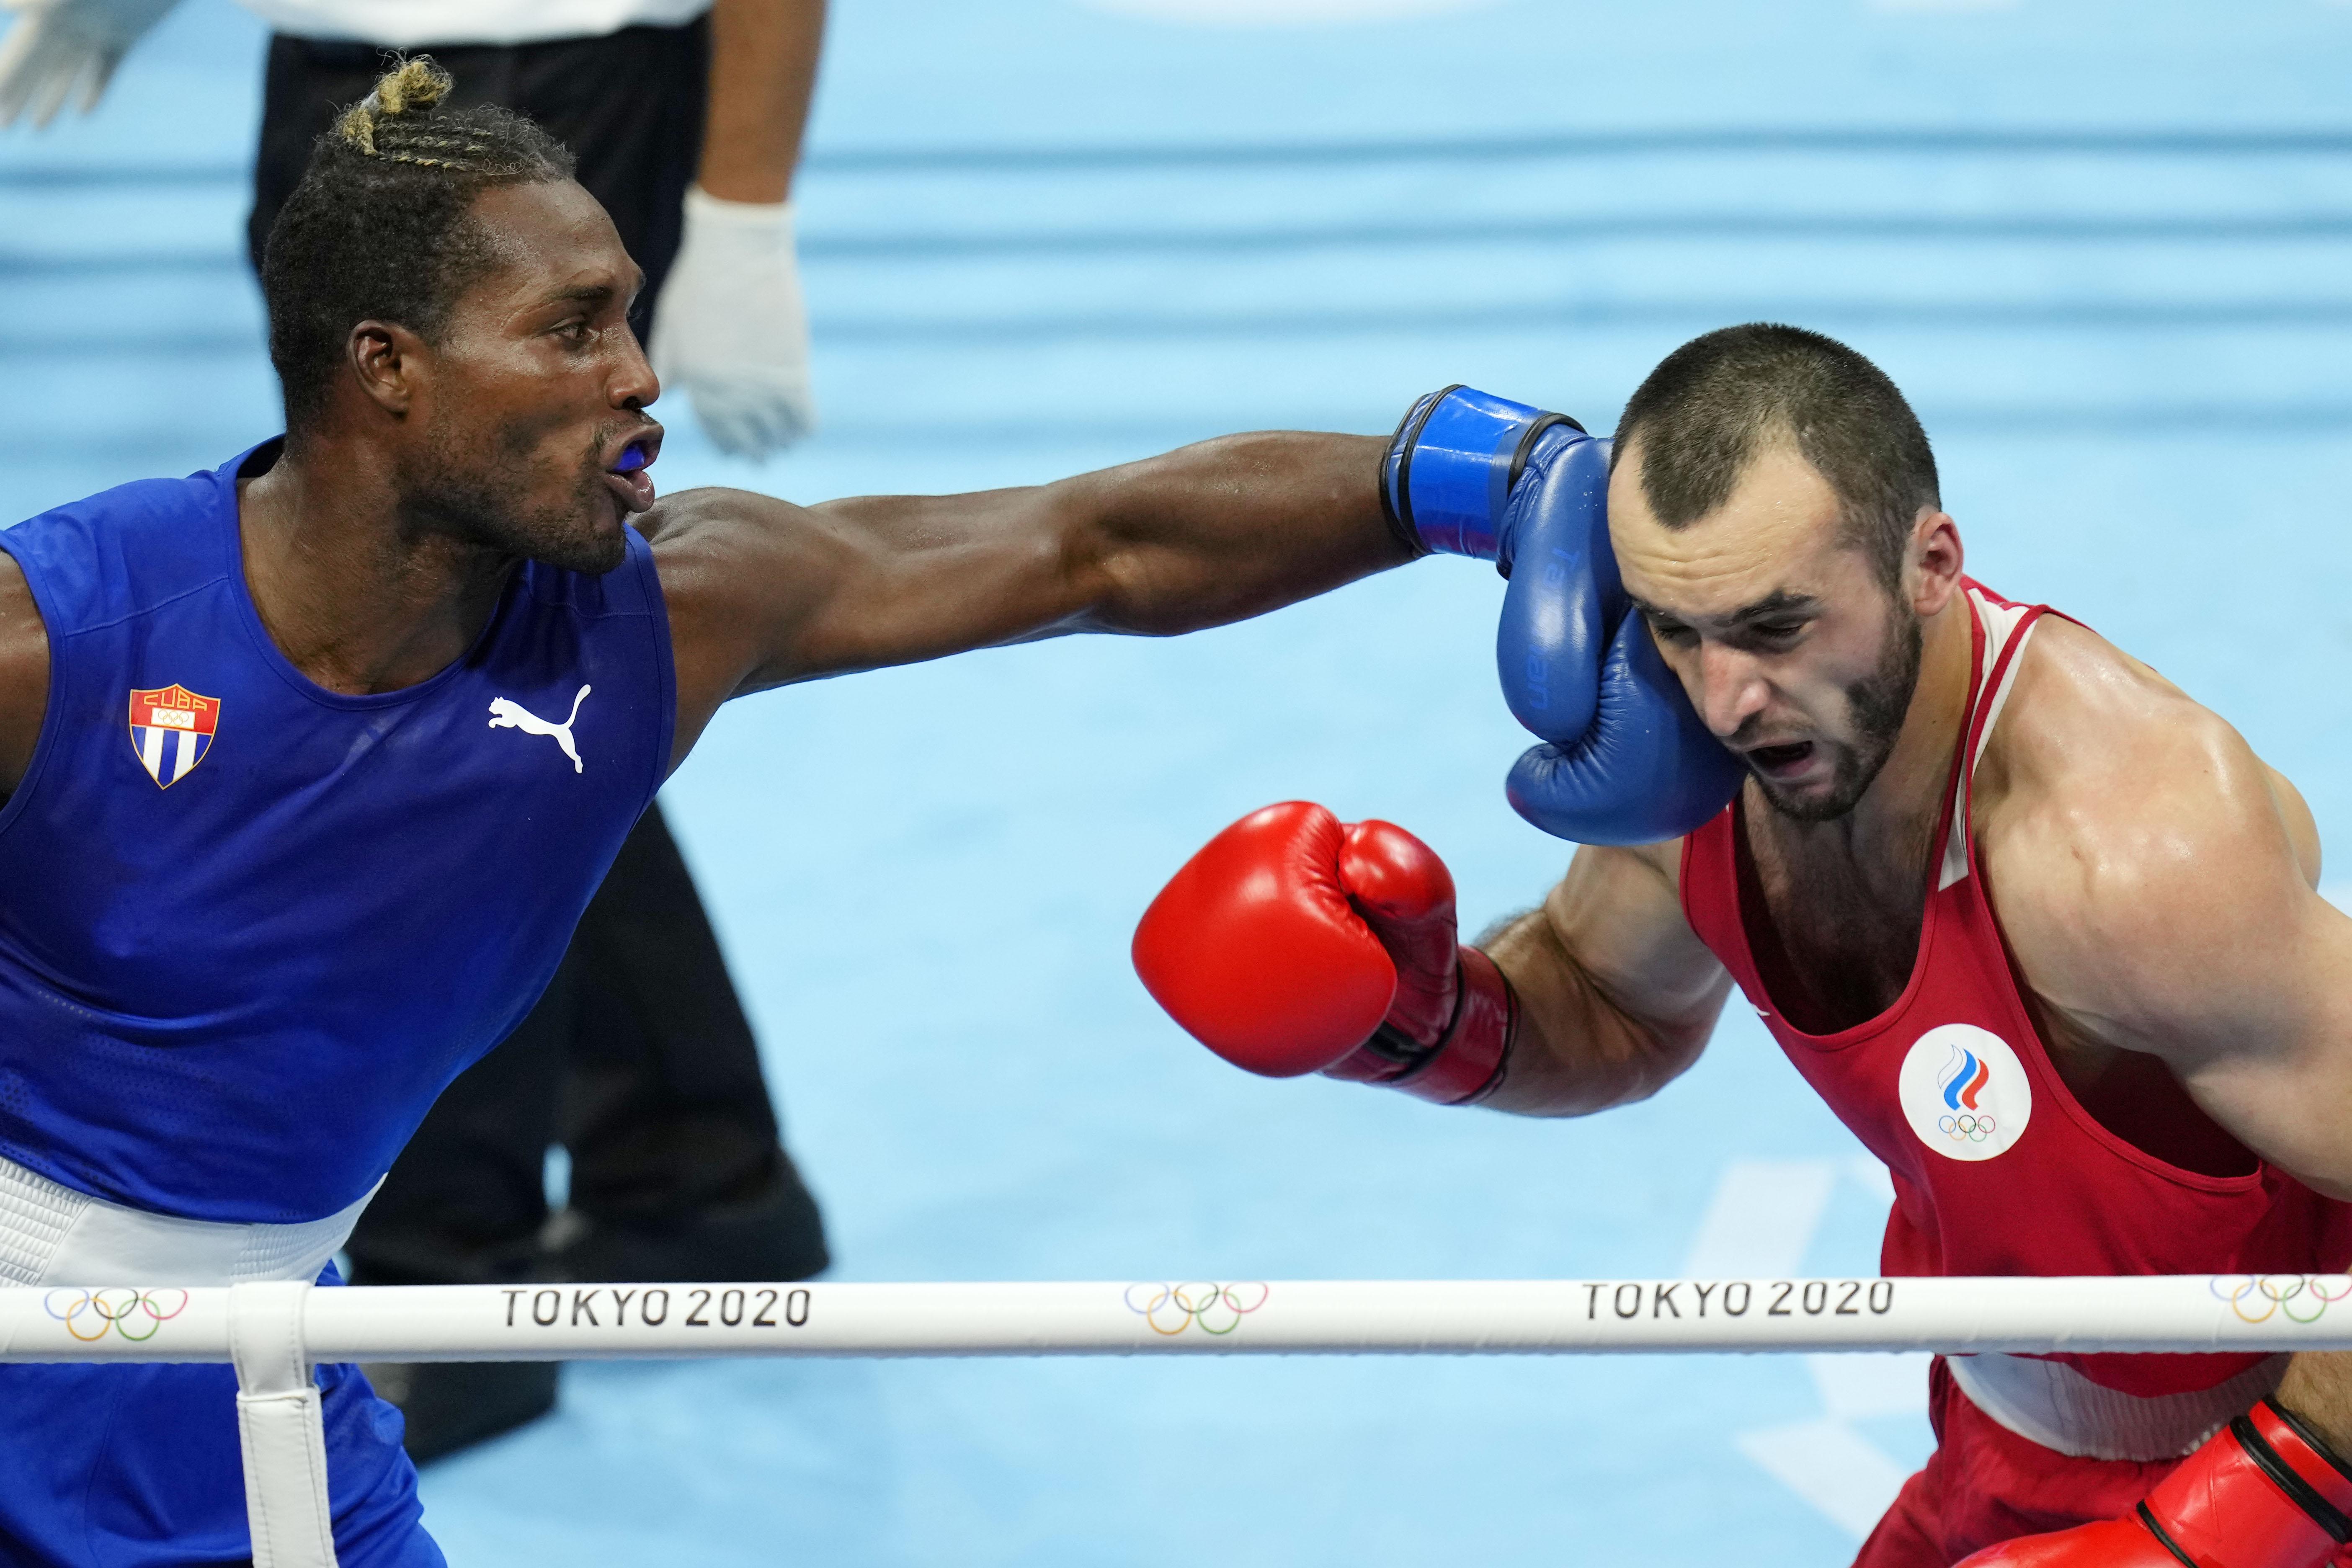 Julio Cesar La Cruz wins his second consecutive Olympic gold medal